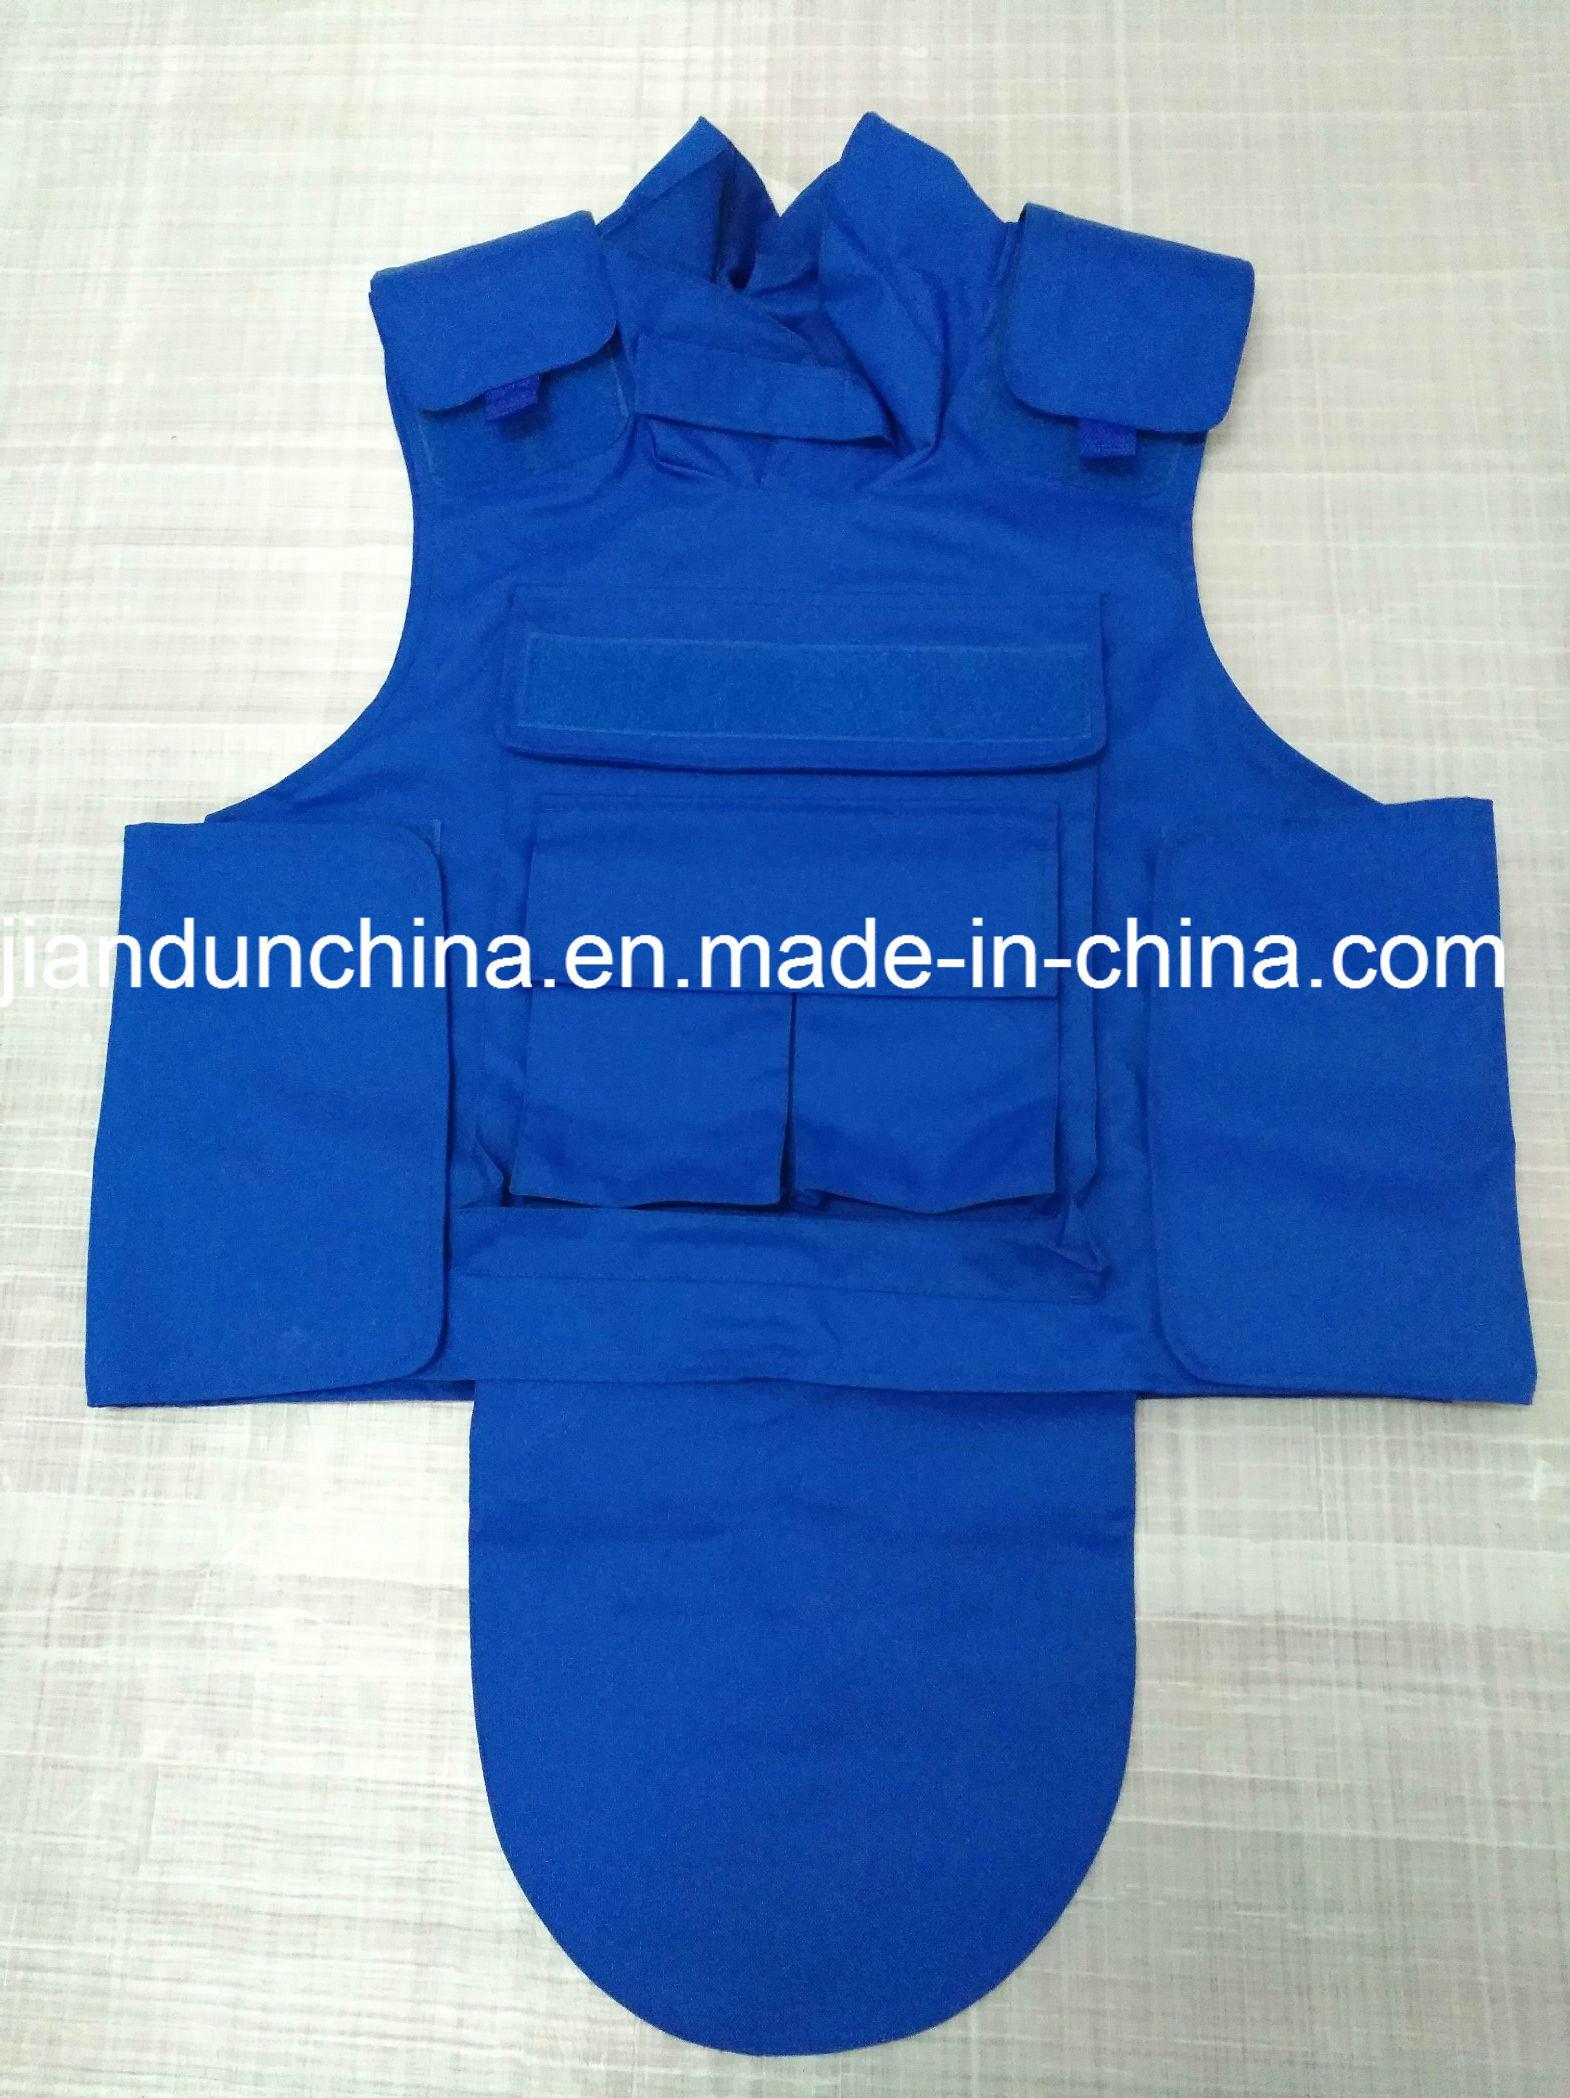 Press Military Protection Vest Bulletproof Full TKJ3lcF1